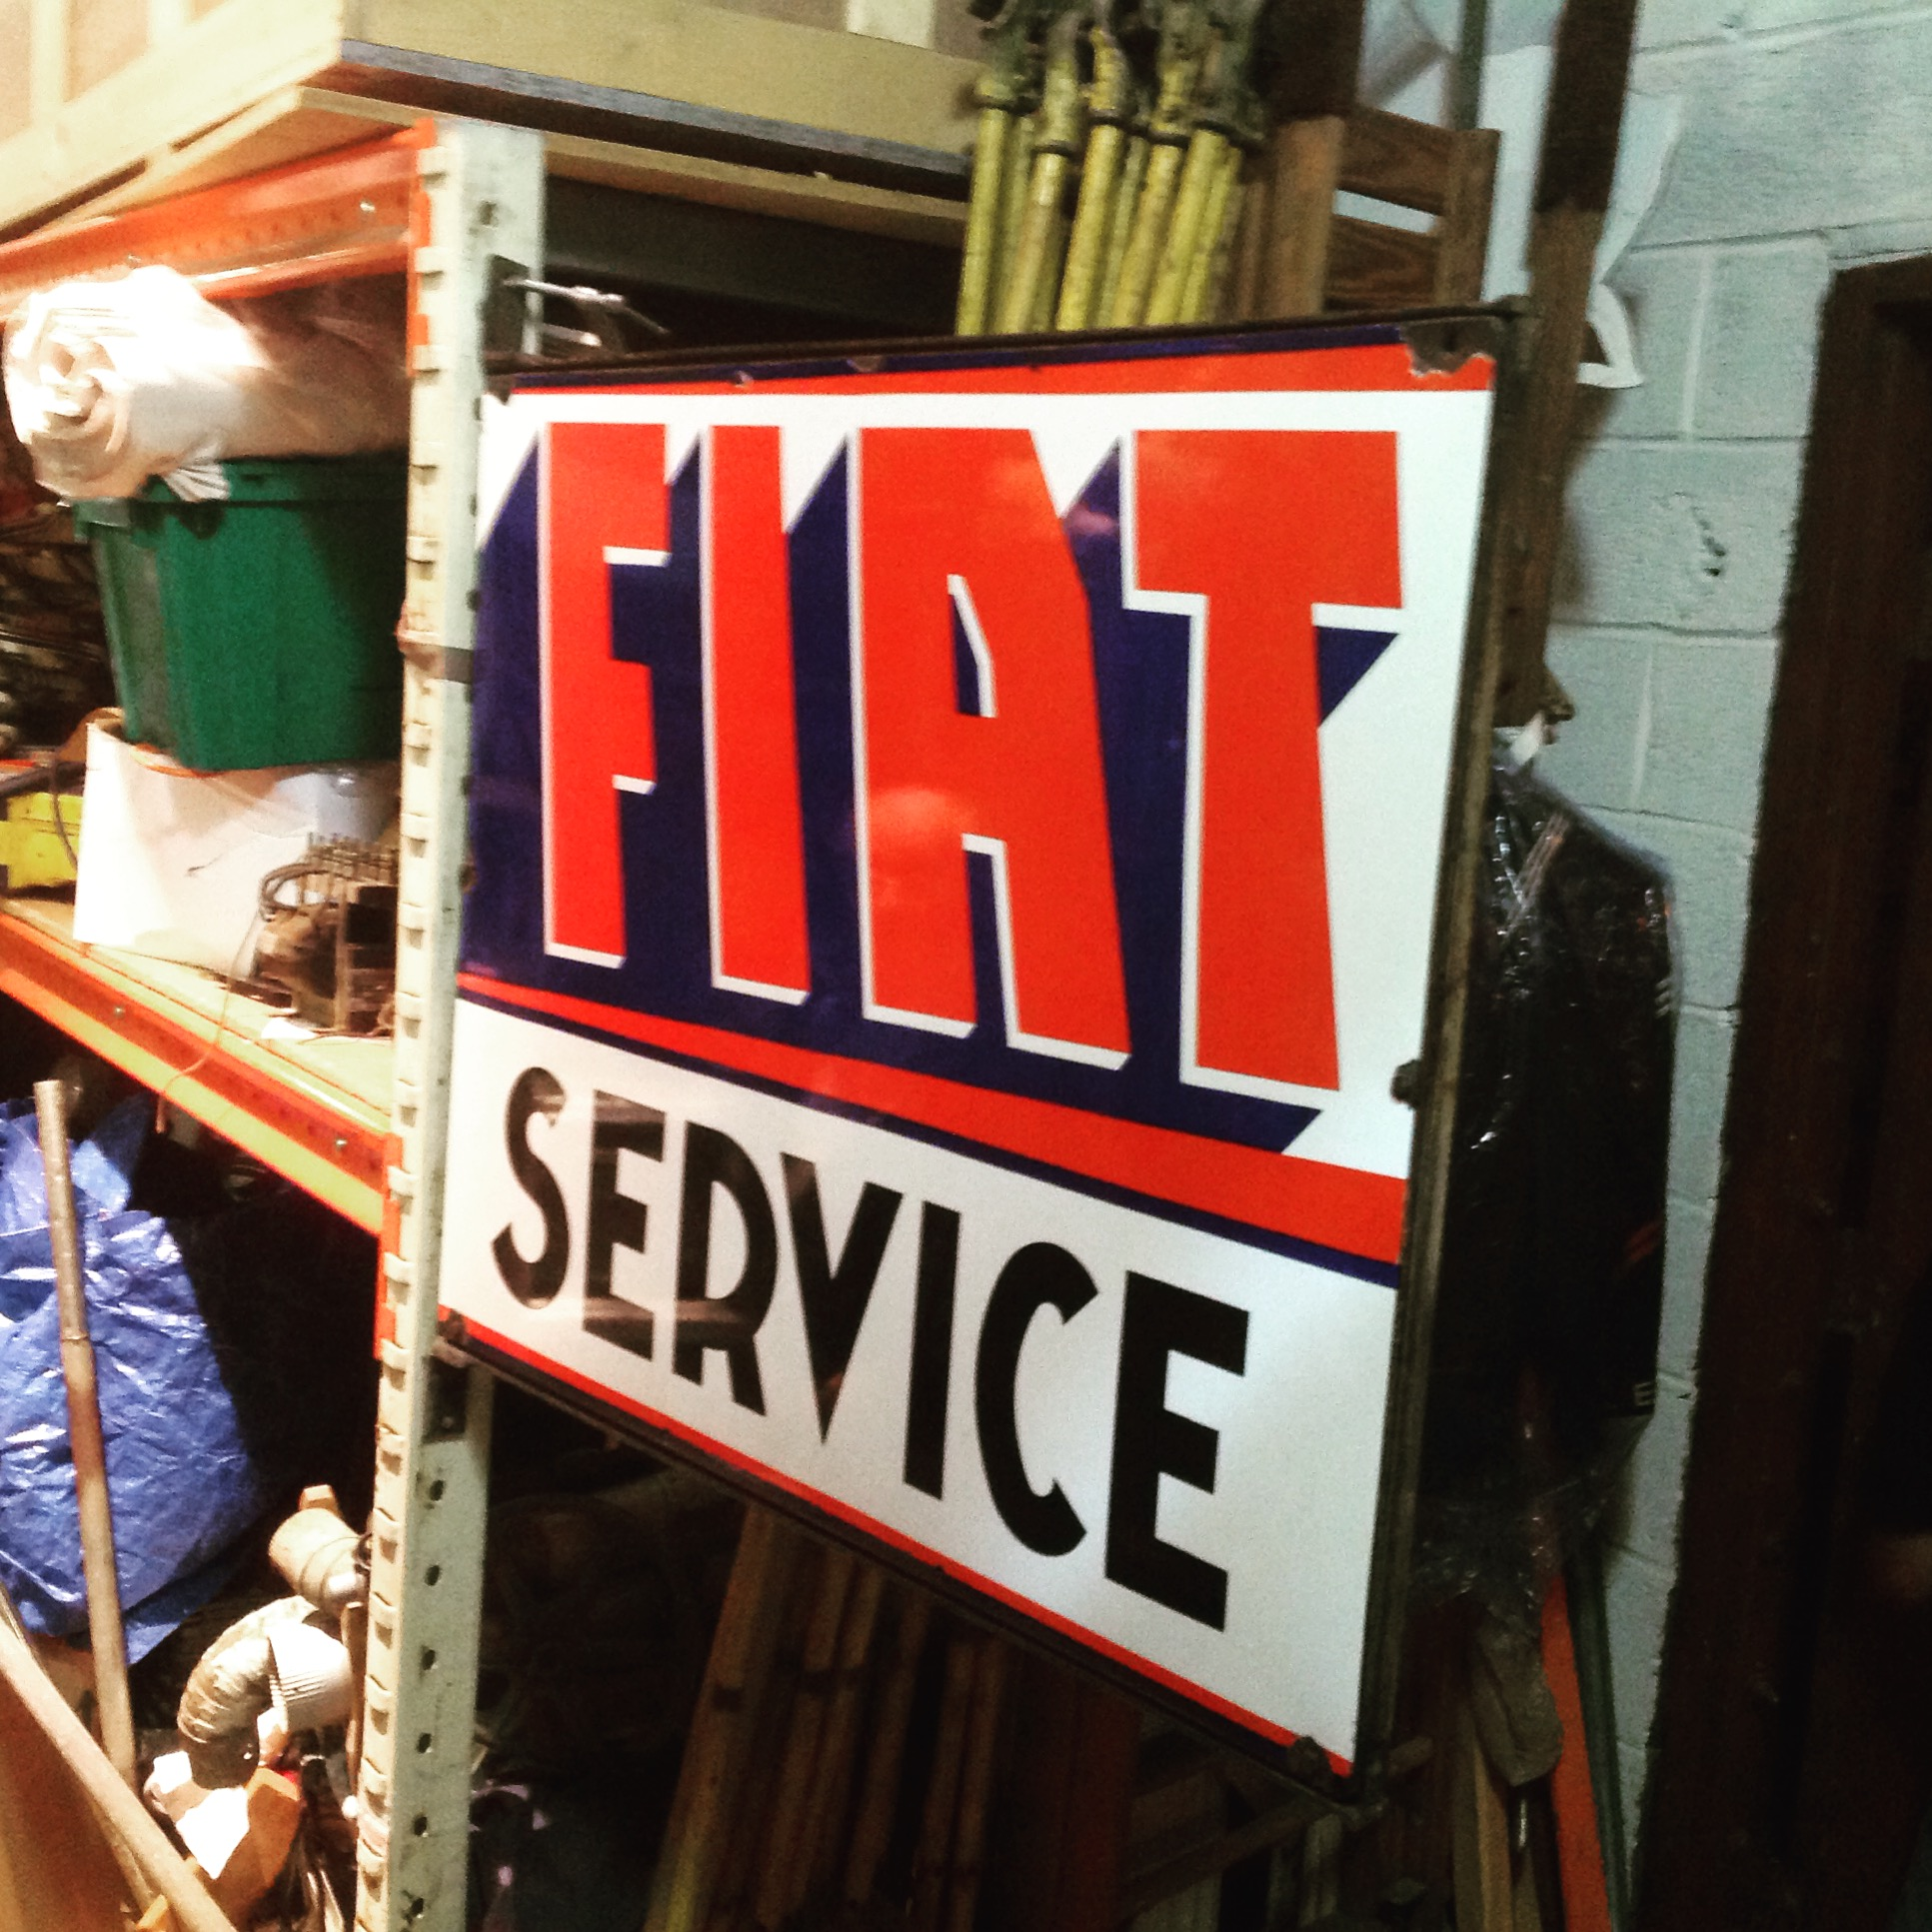 Vintage Advertising Porcelain Double Side Fiat Service Sign - Fiat service